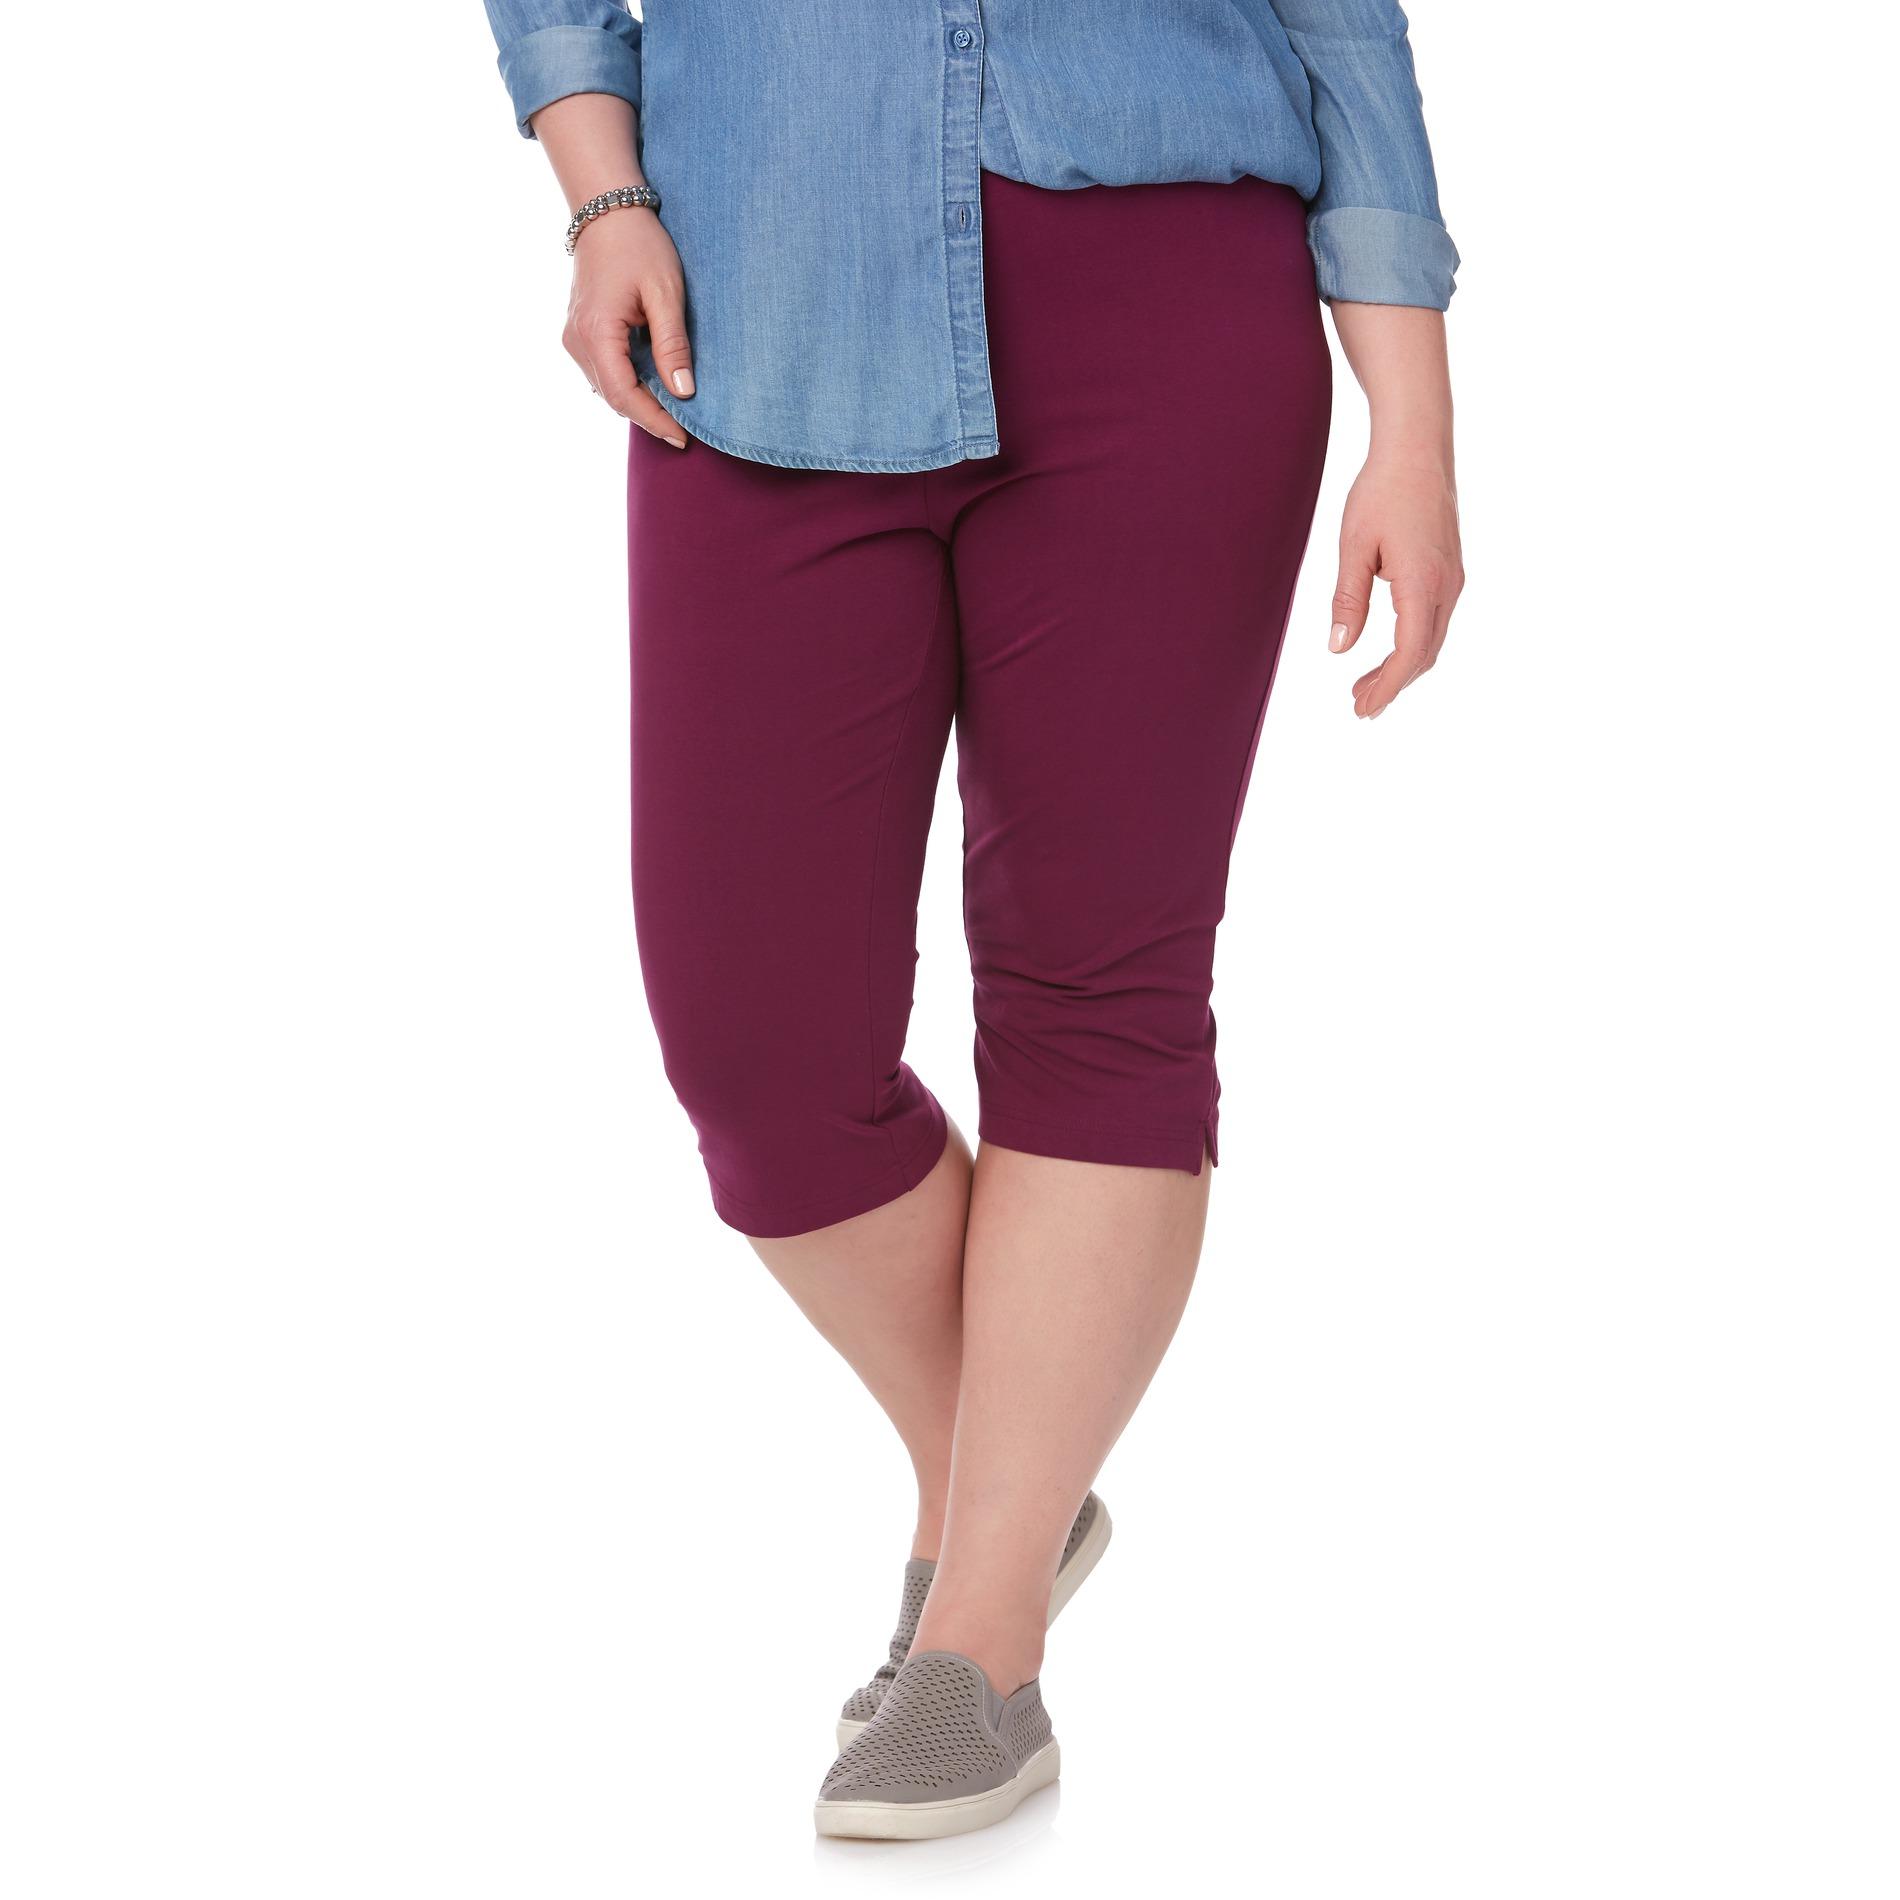 Basic Editions Women' Capri Leggings